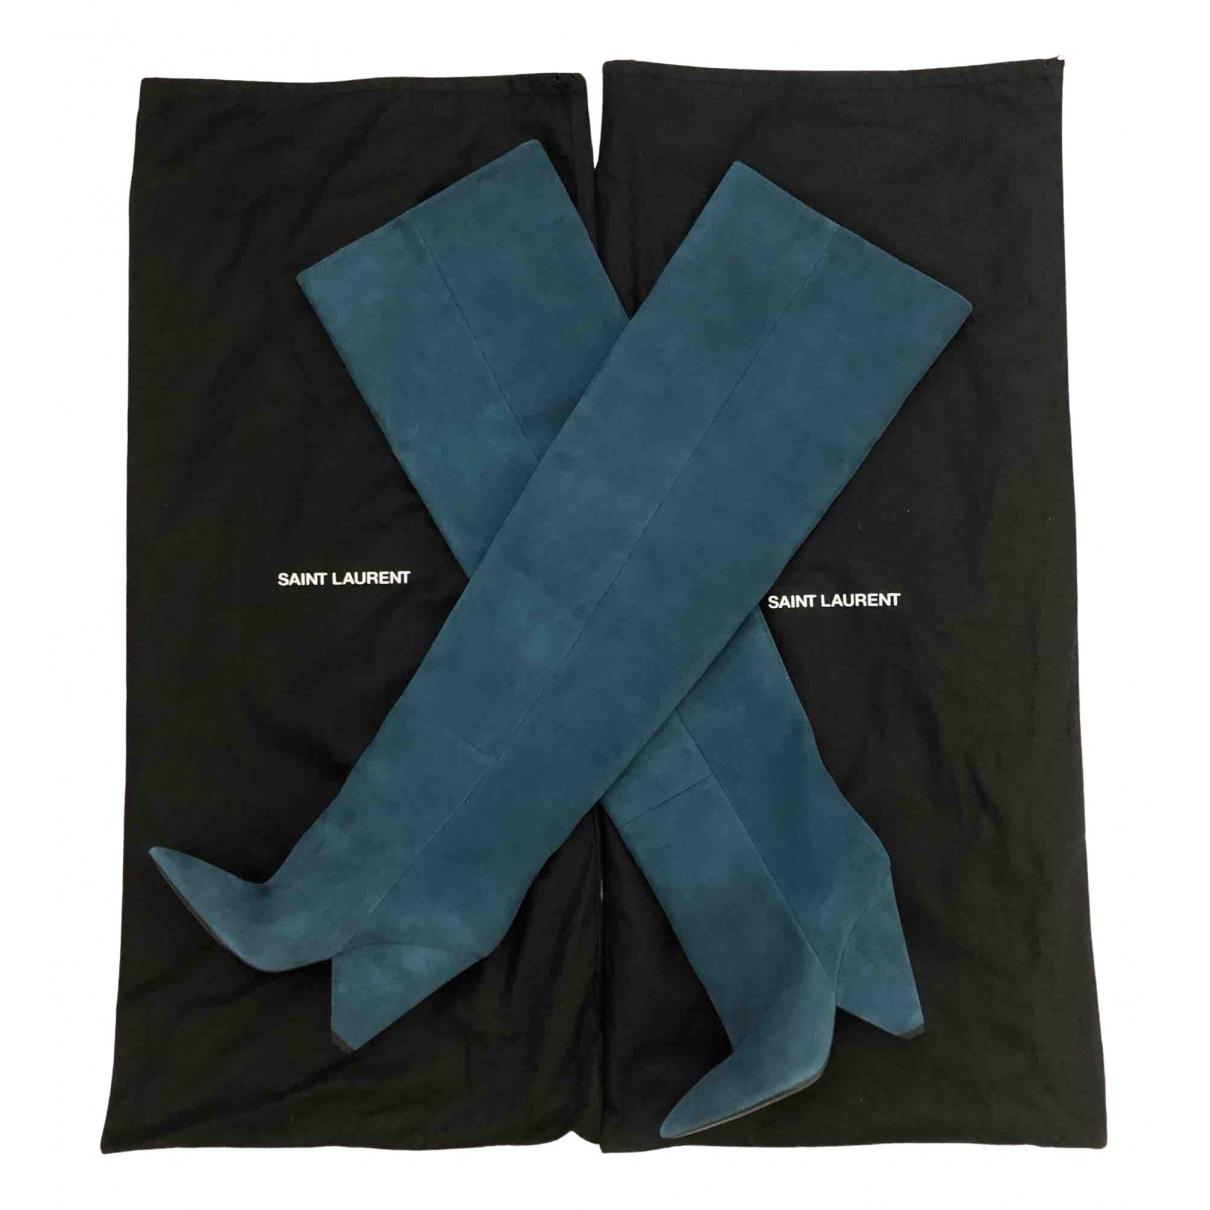 Saint Laurent Niki Stiefel in  Blau Veloursleder